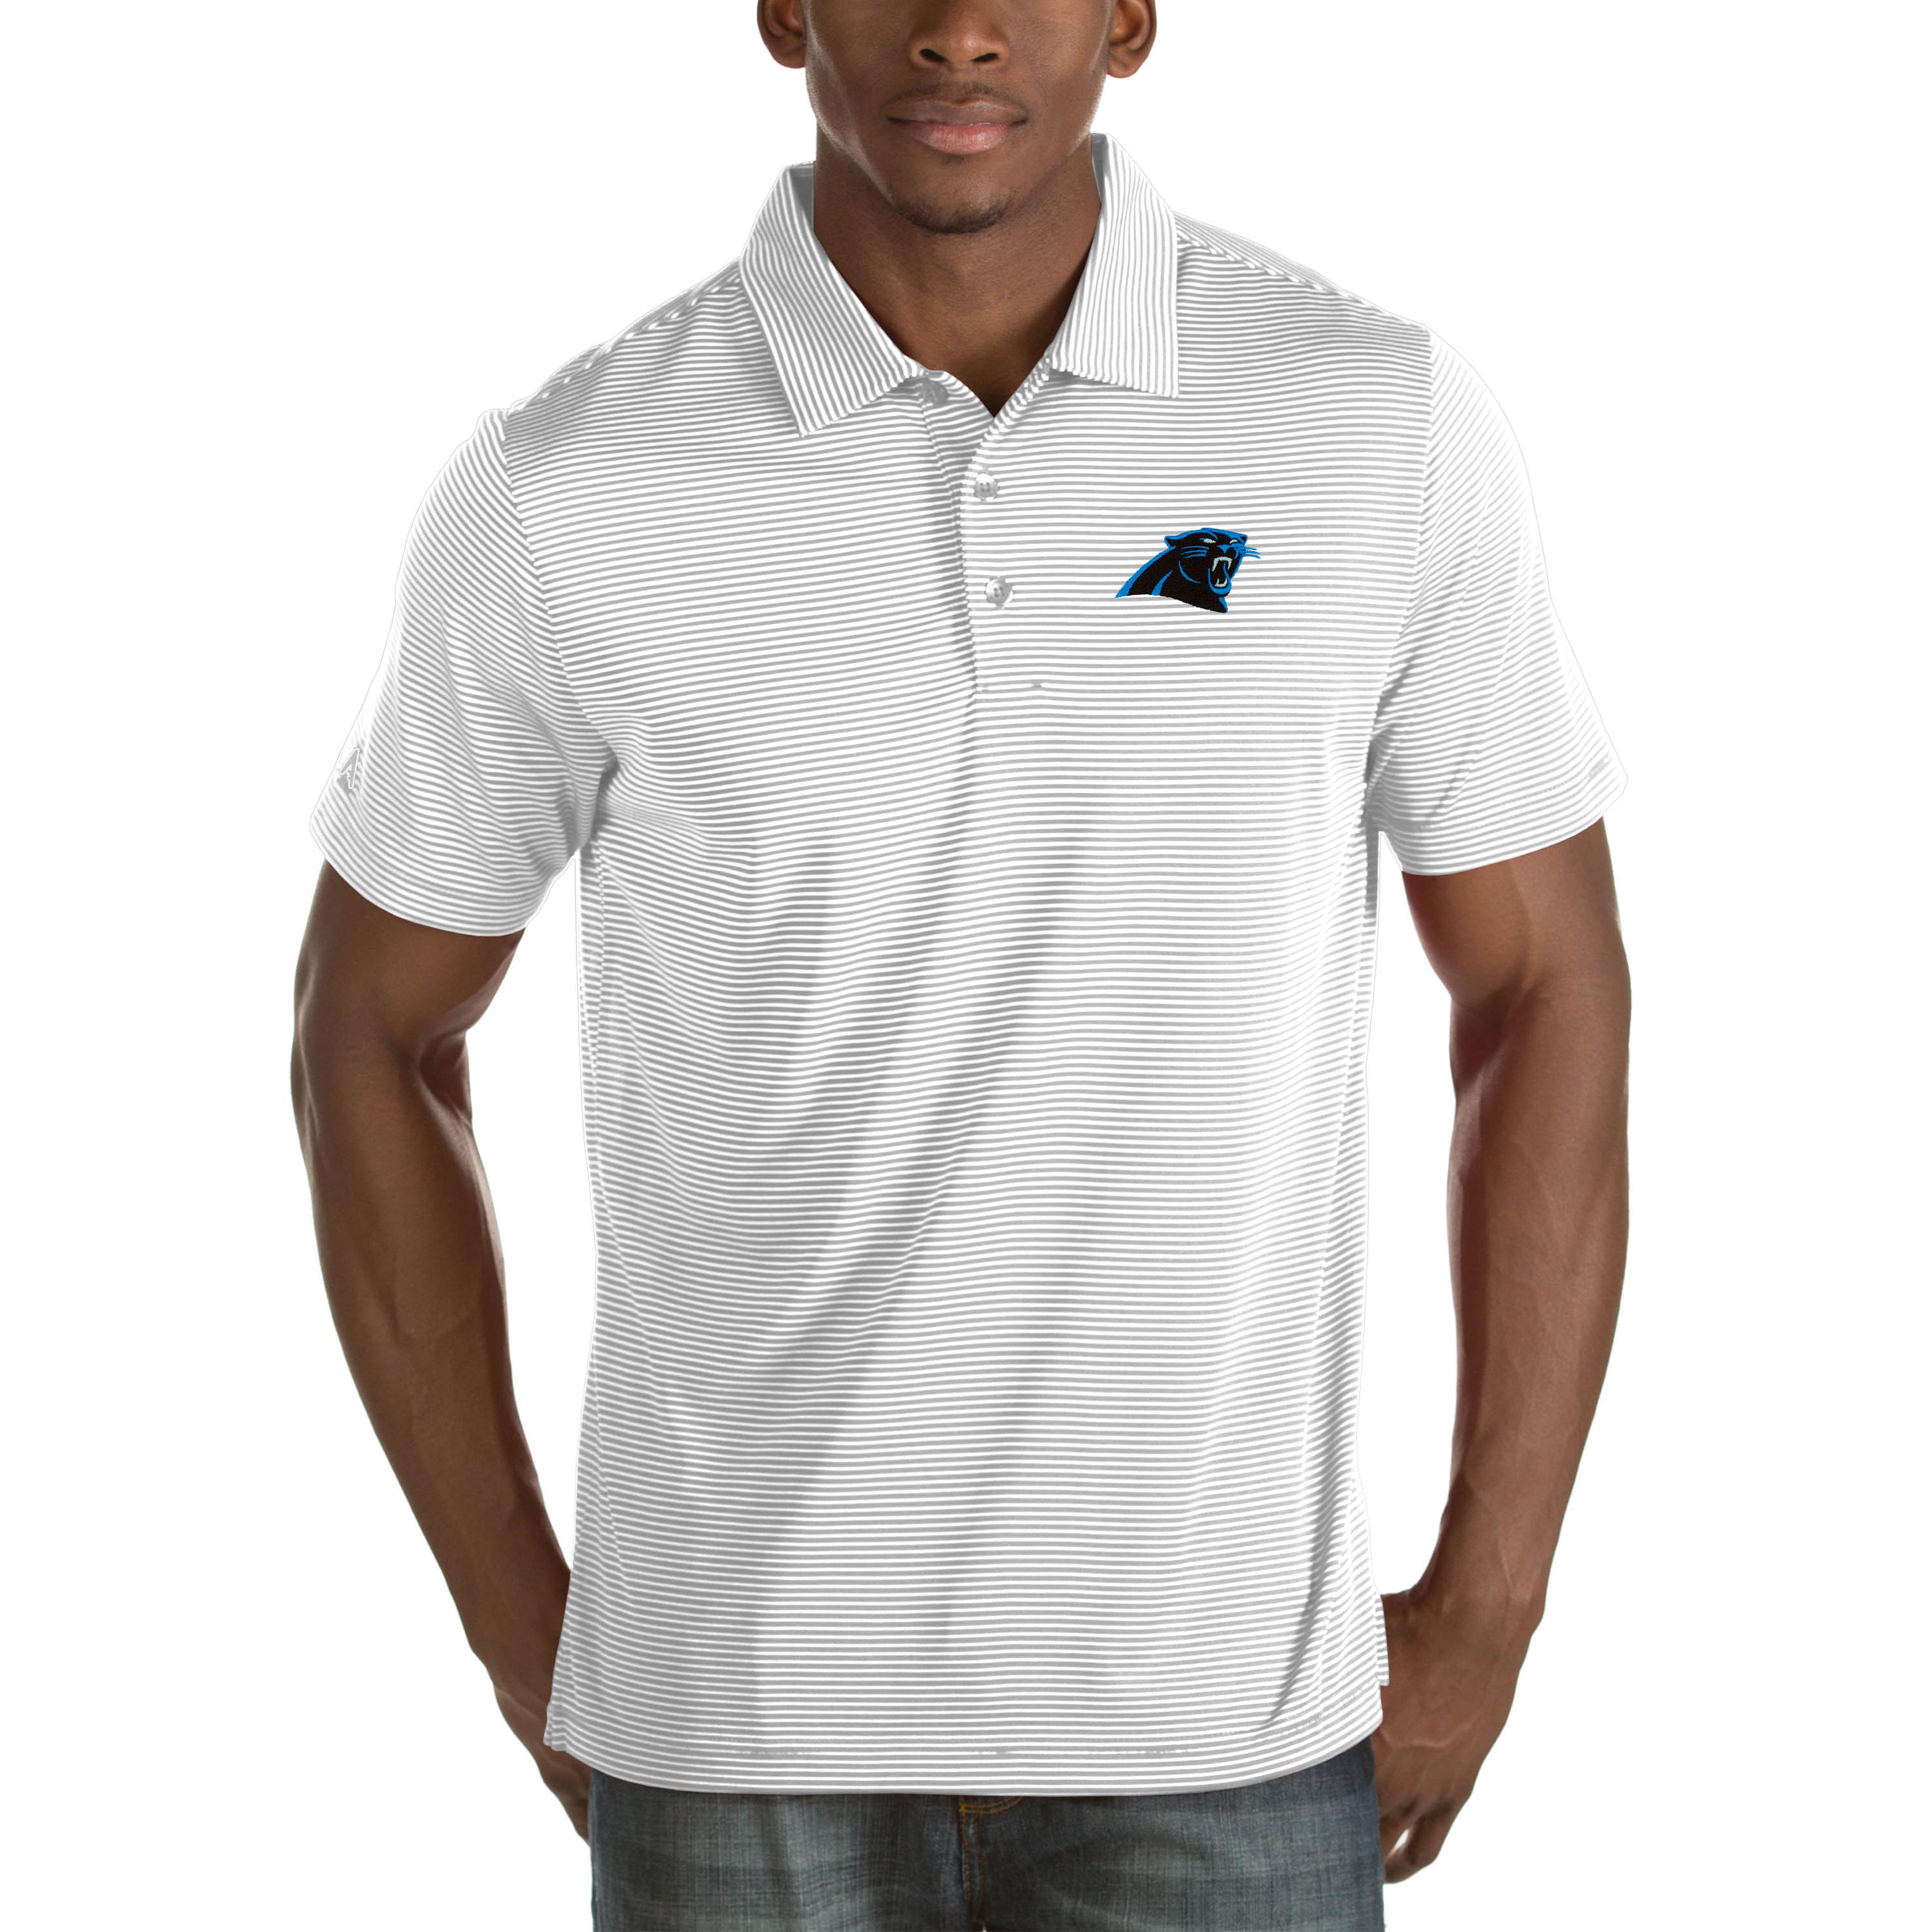 Carolina Panthers Antigua Quest Big & Tall Polo - White